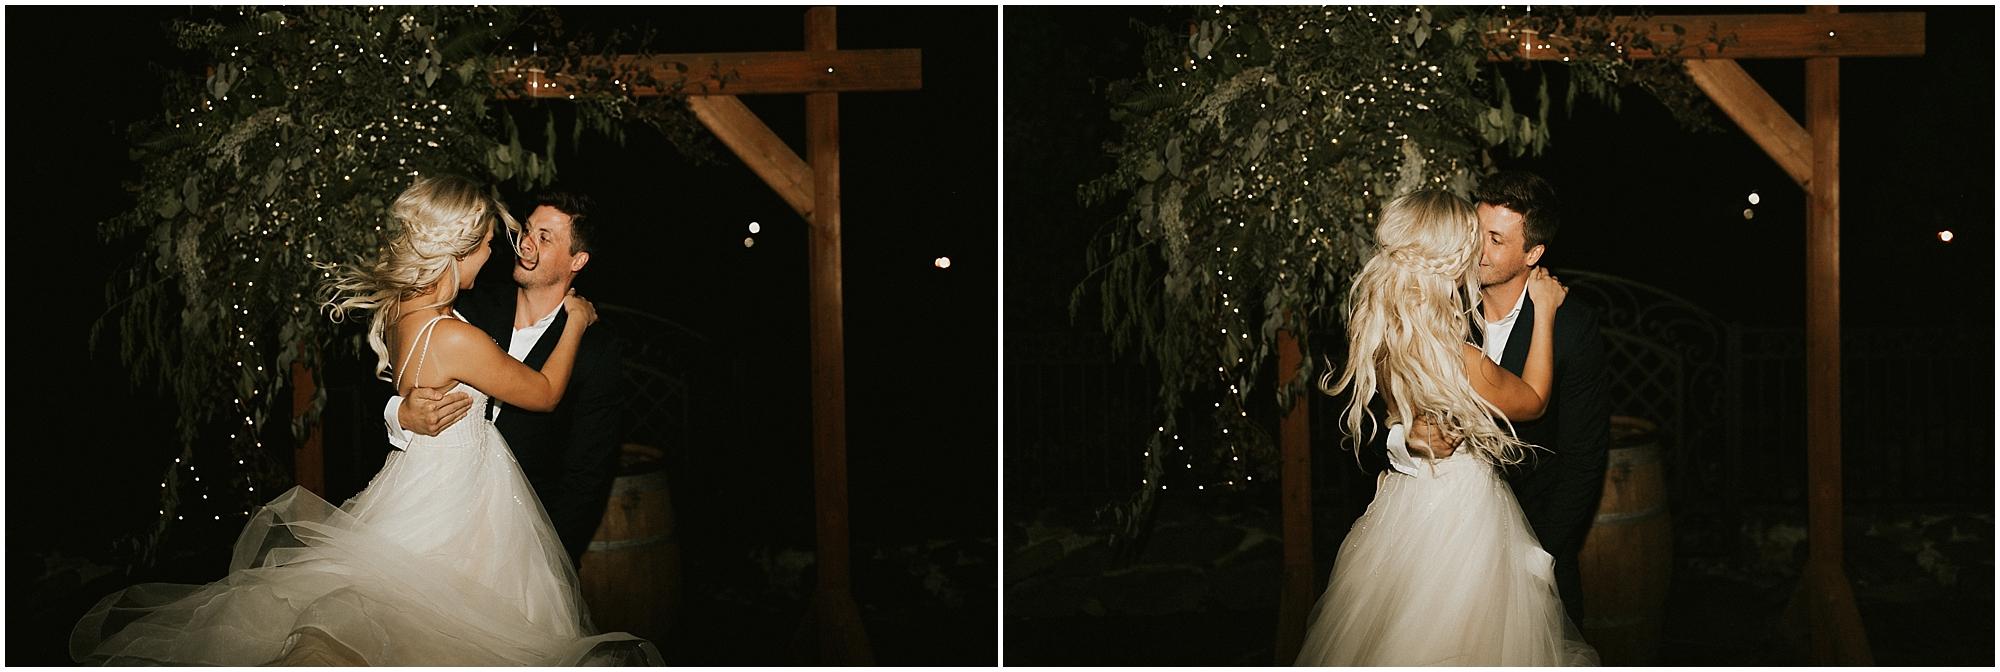 Chateau Rive Spokane Wedding Cassie Trottier Photography1167.jpg